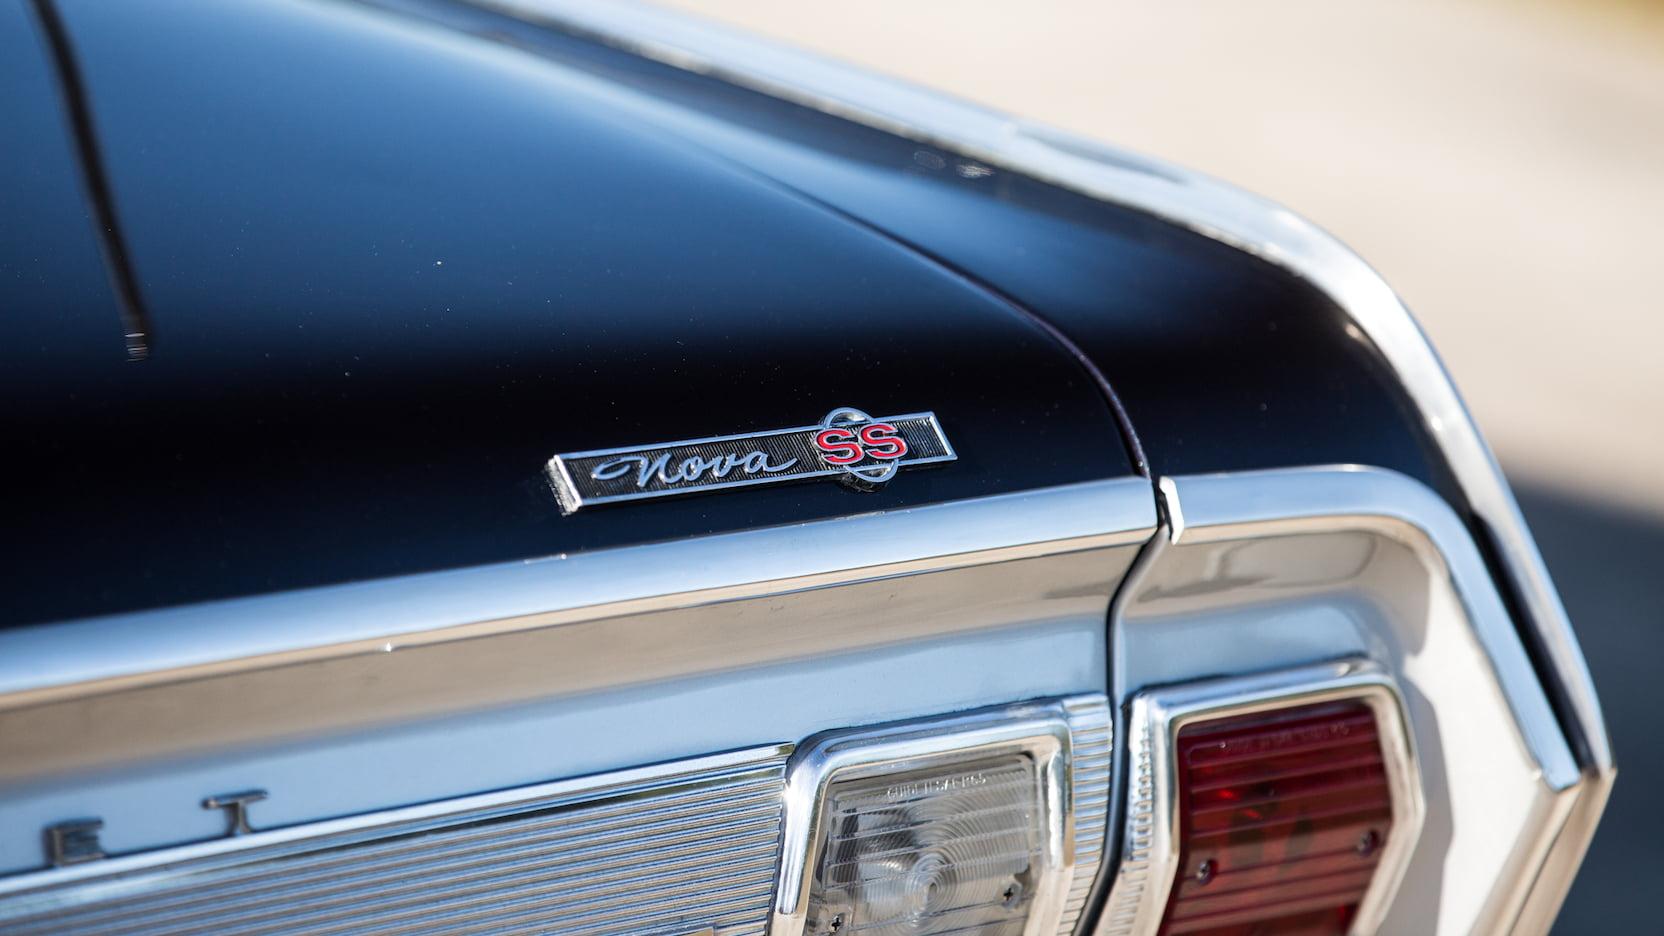 1965 Chevrolet Nova SS badge trunk